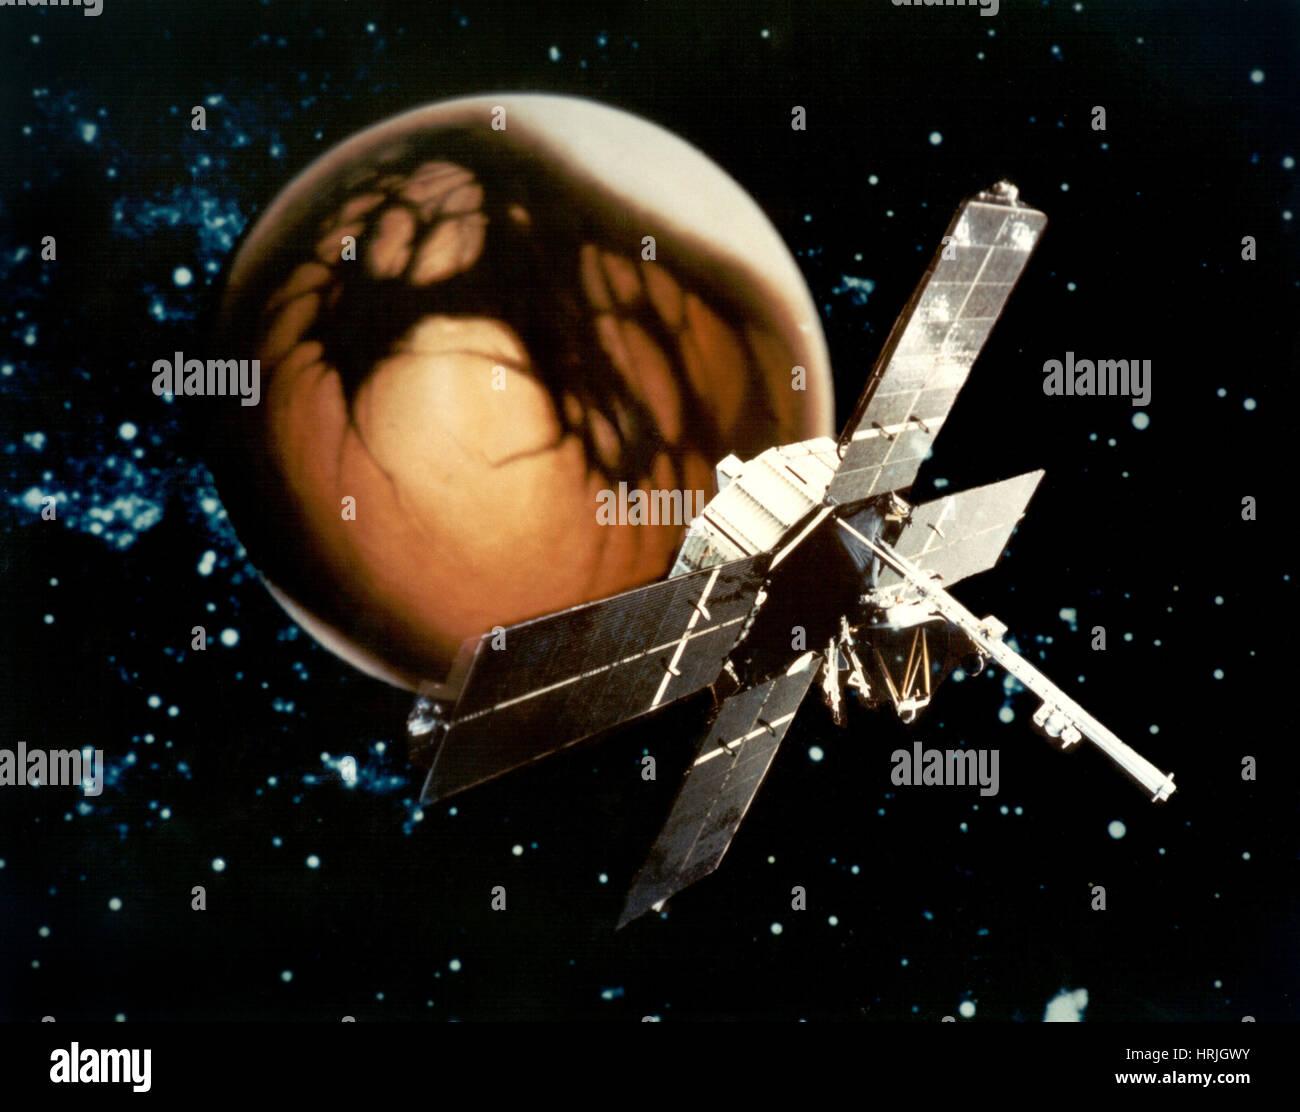 mariner 10 space probe - HD1280×848